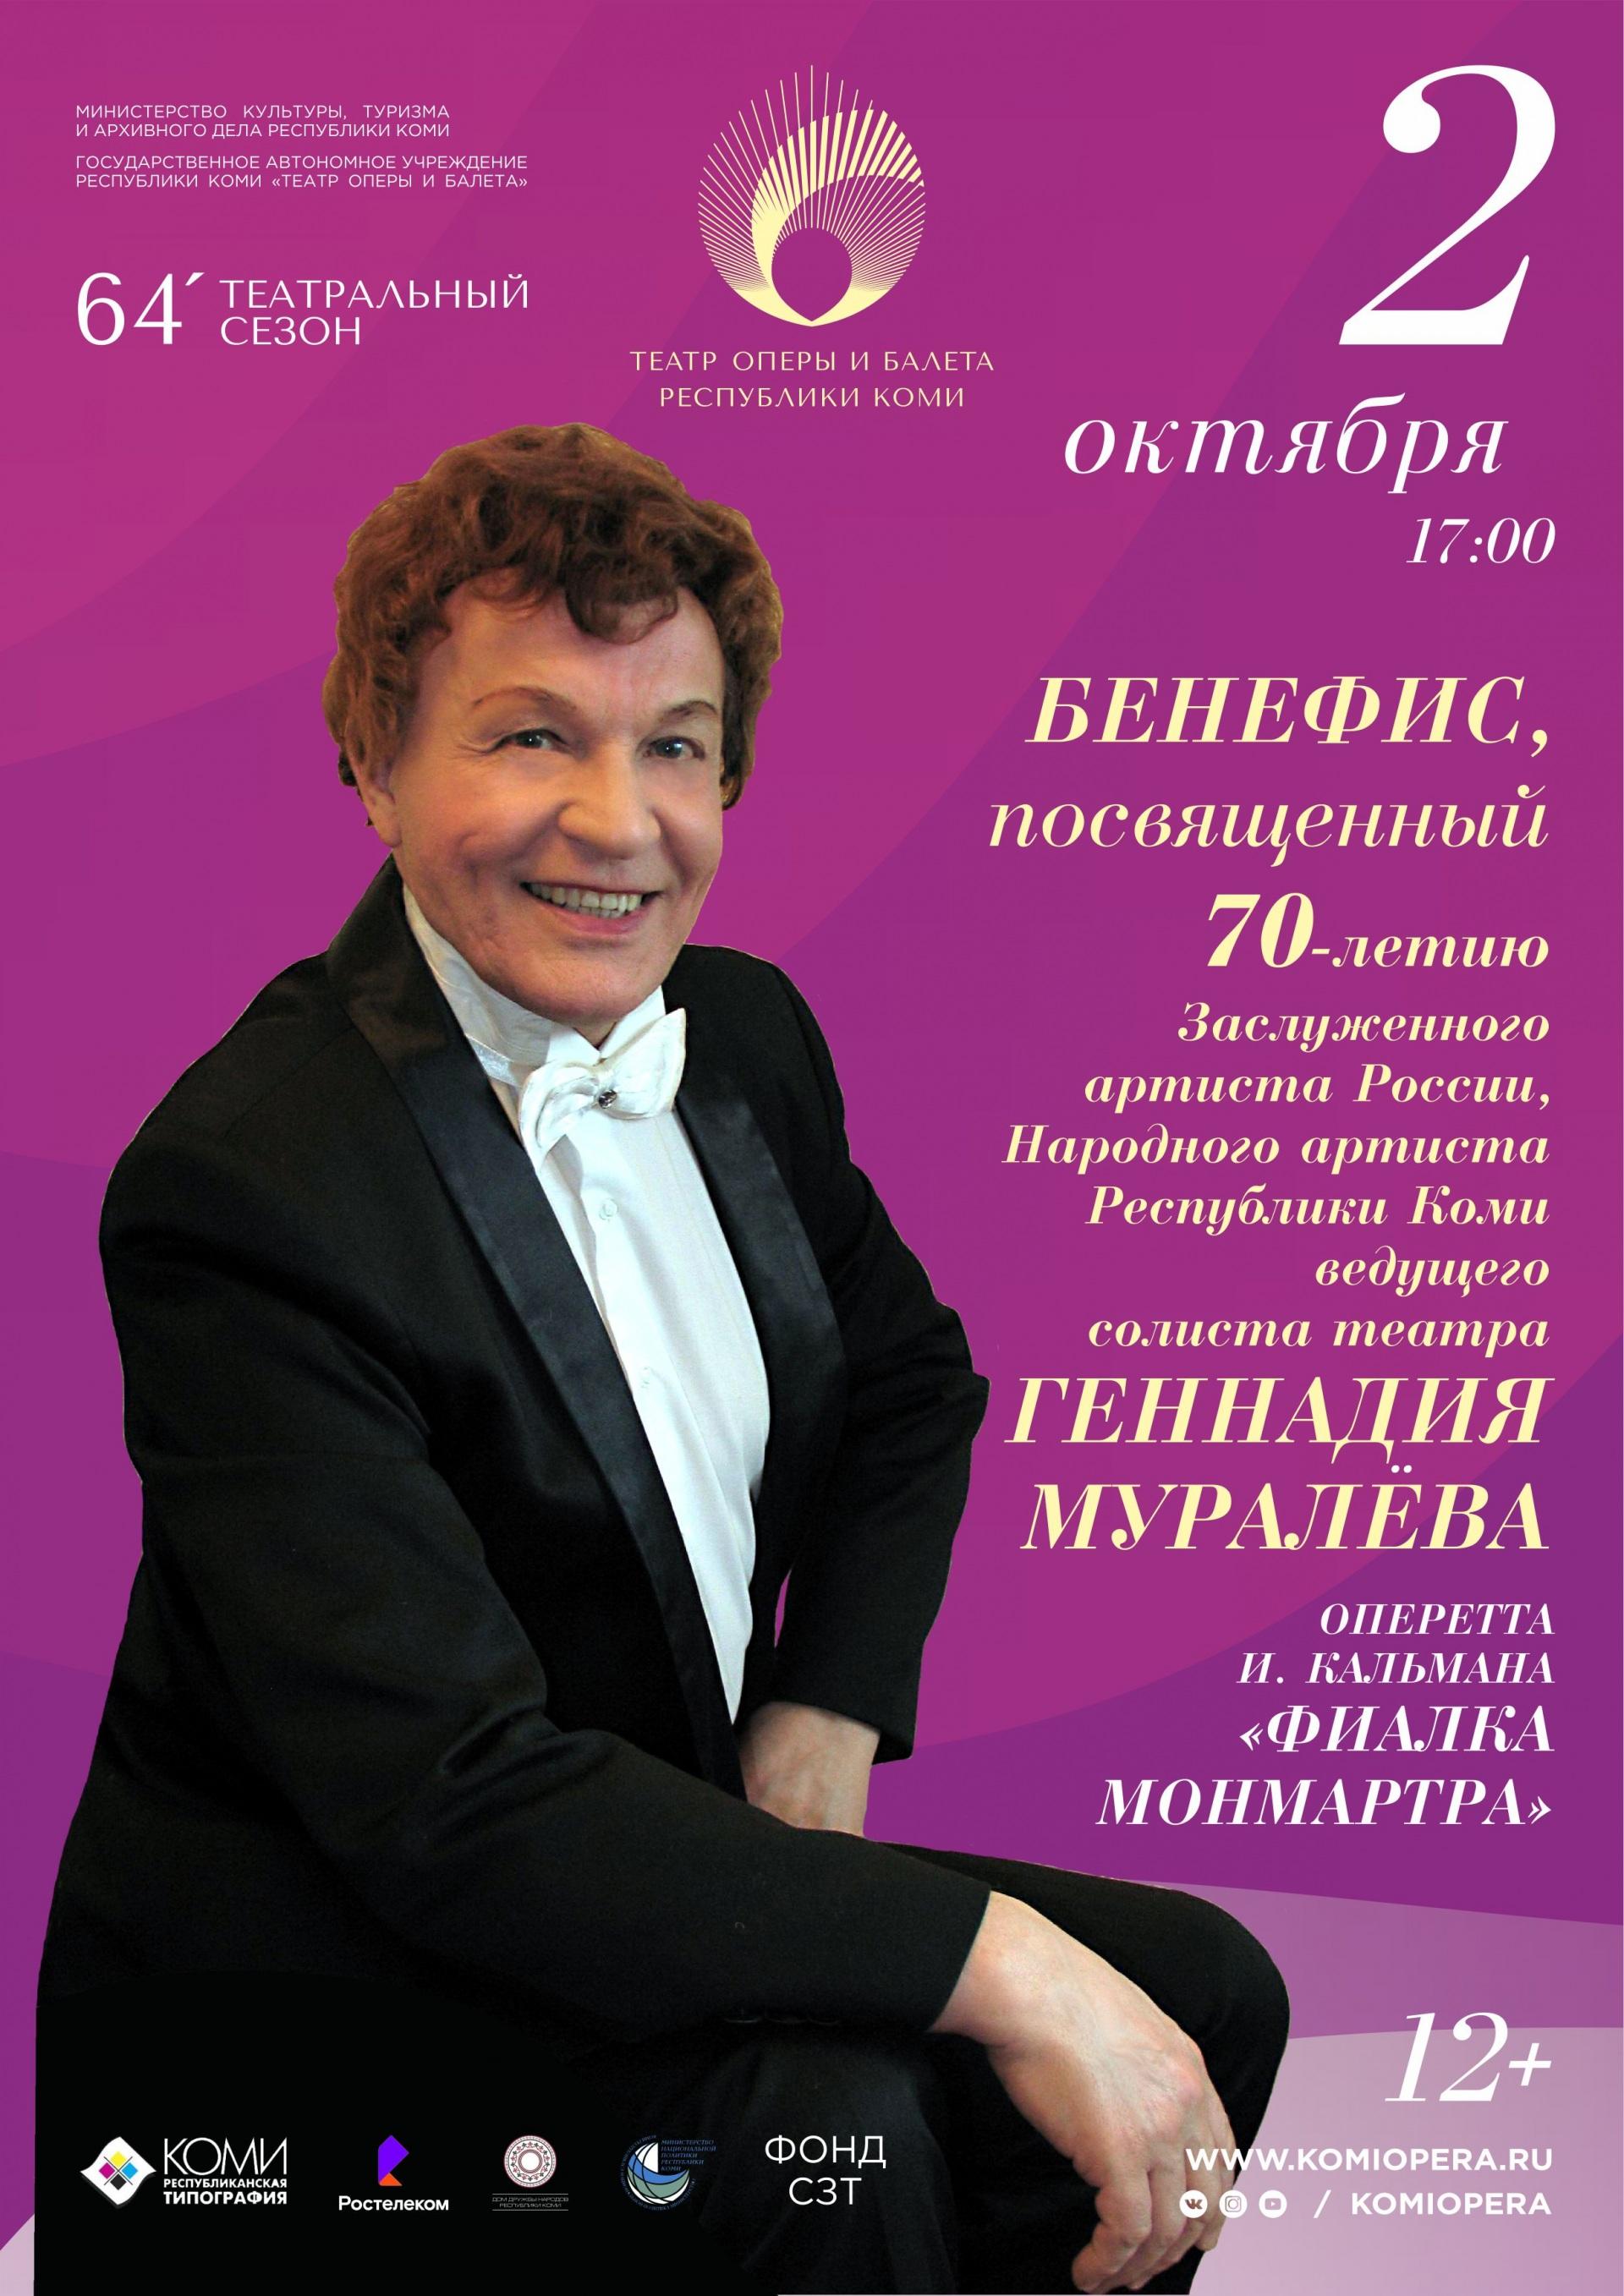 Benefis-Muralev_dlya-pechati-1.jpg